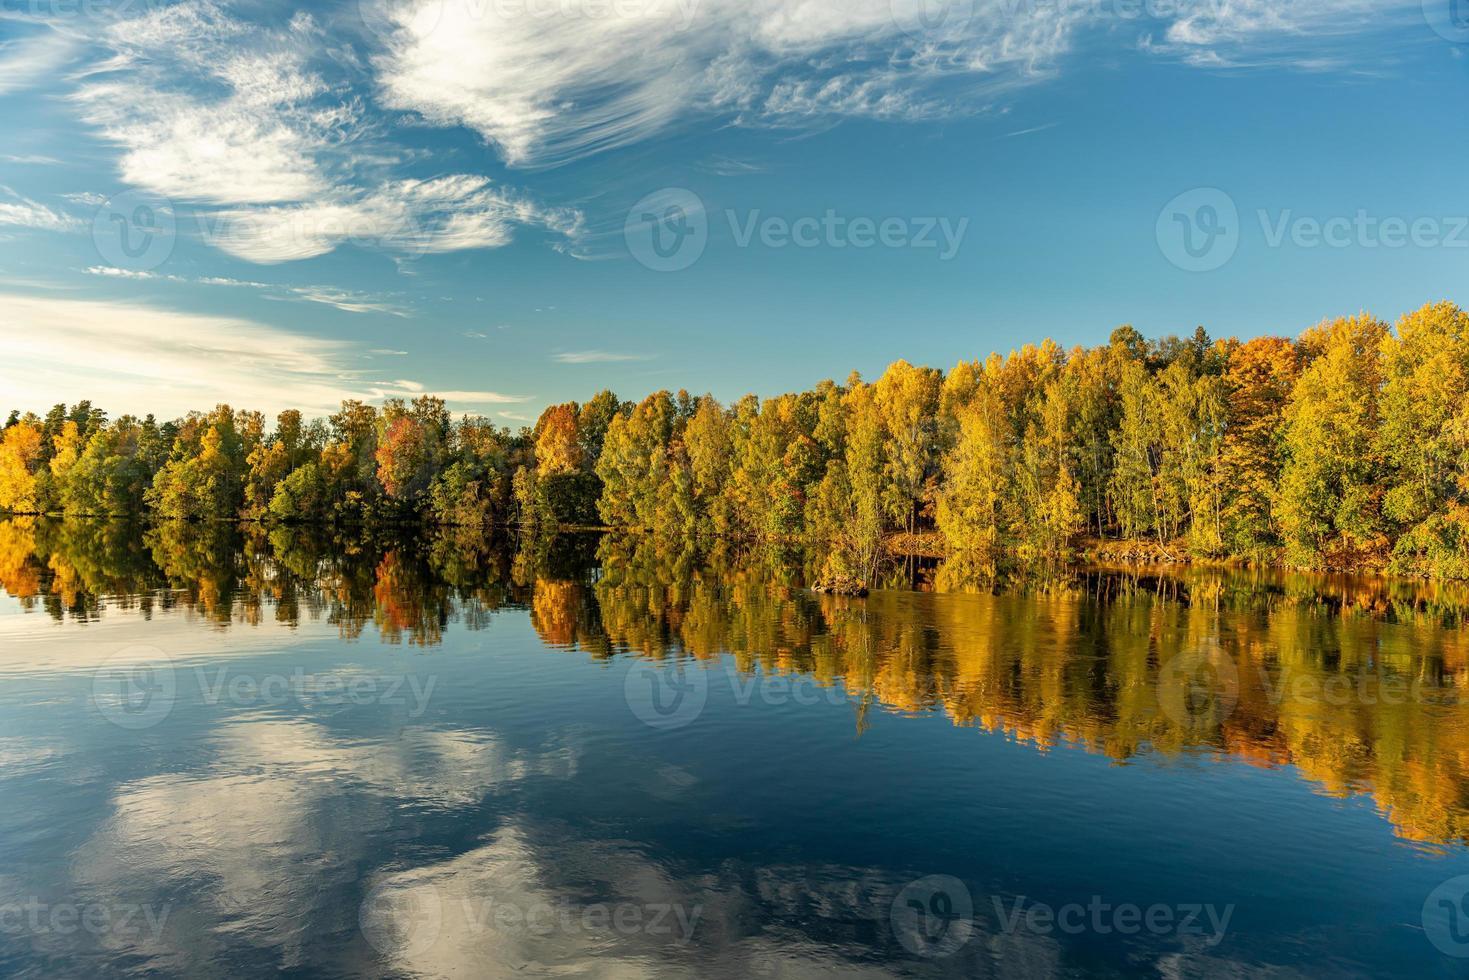 herbstfarbene Bäume entlang eines Flussufers in Schweden foto